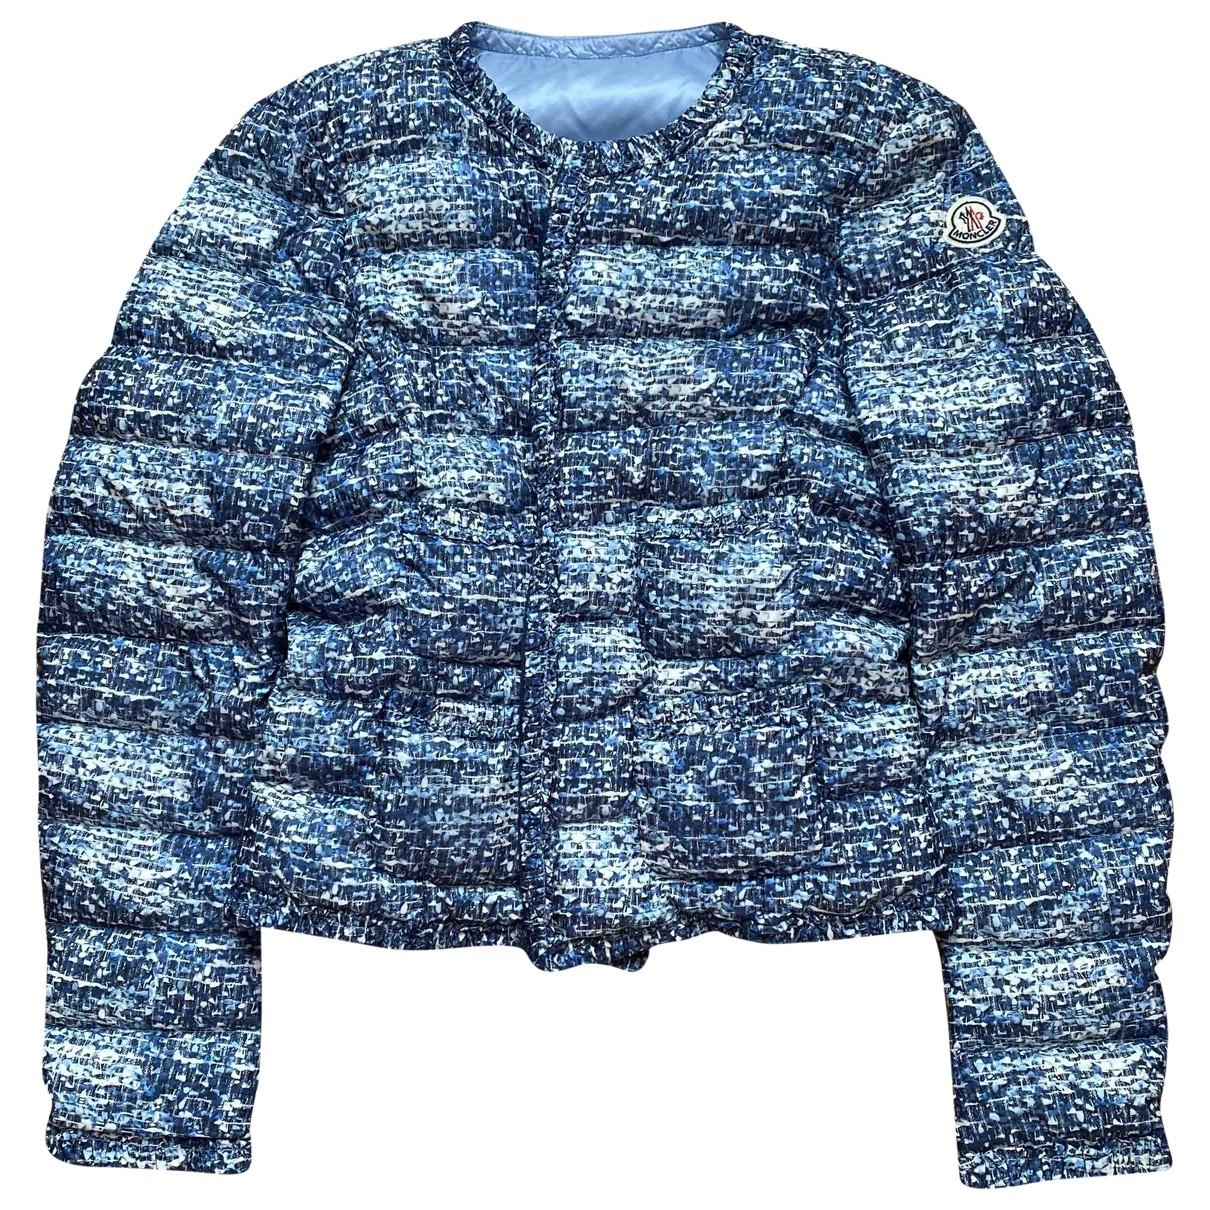 Moncler \N Blue coat for Women 2 0-5